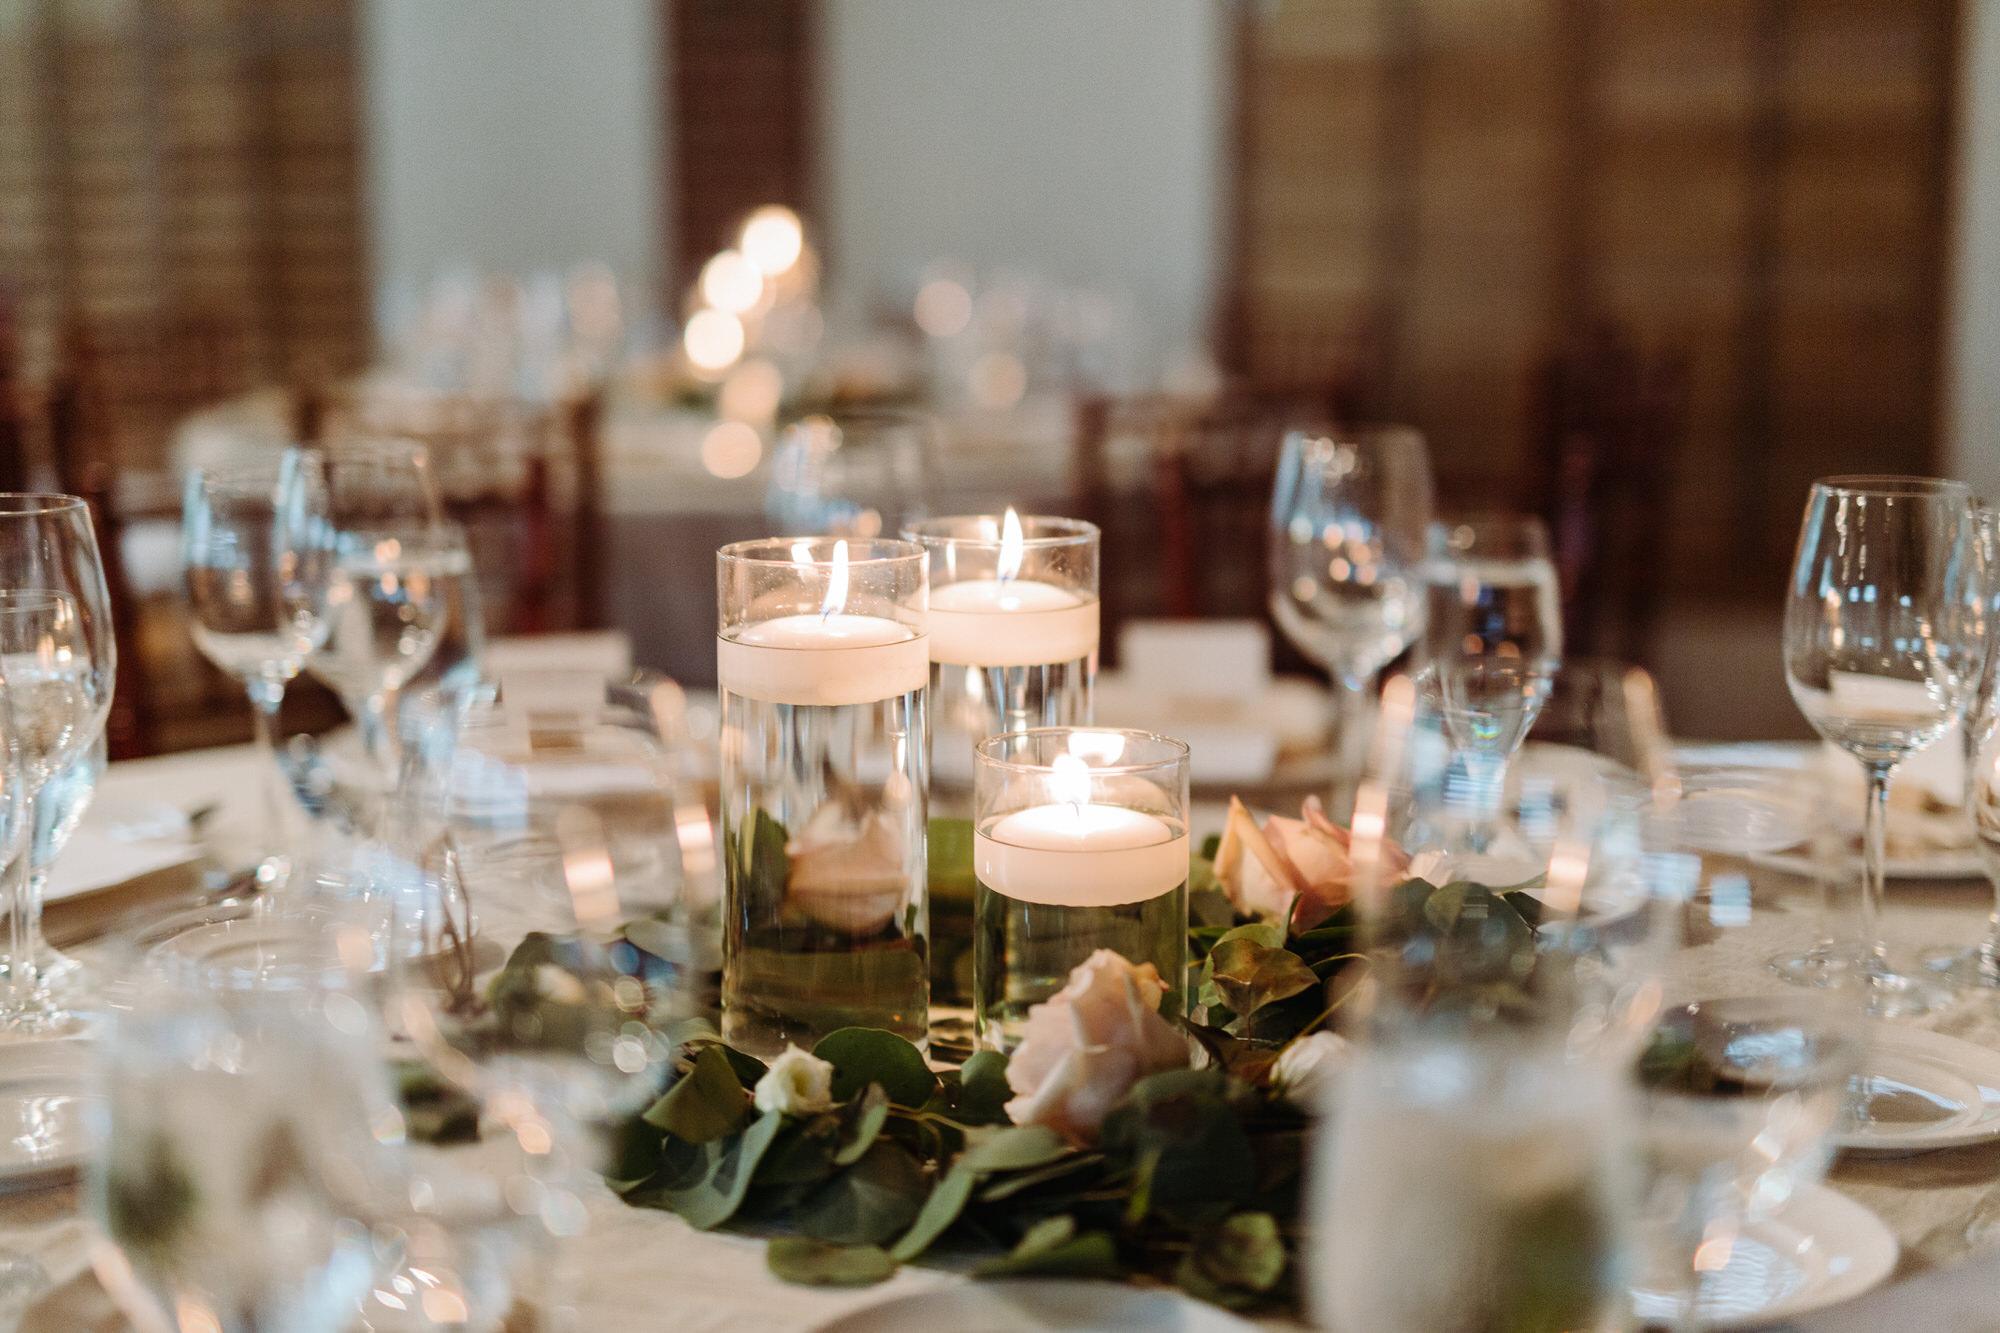 st-lukes-chapel-cannon-green-charleston-wedding-959.JPG